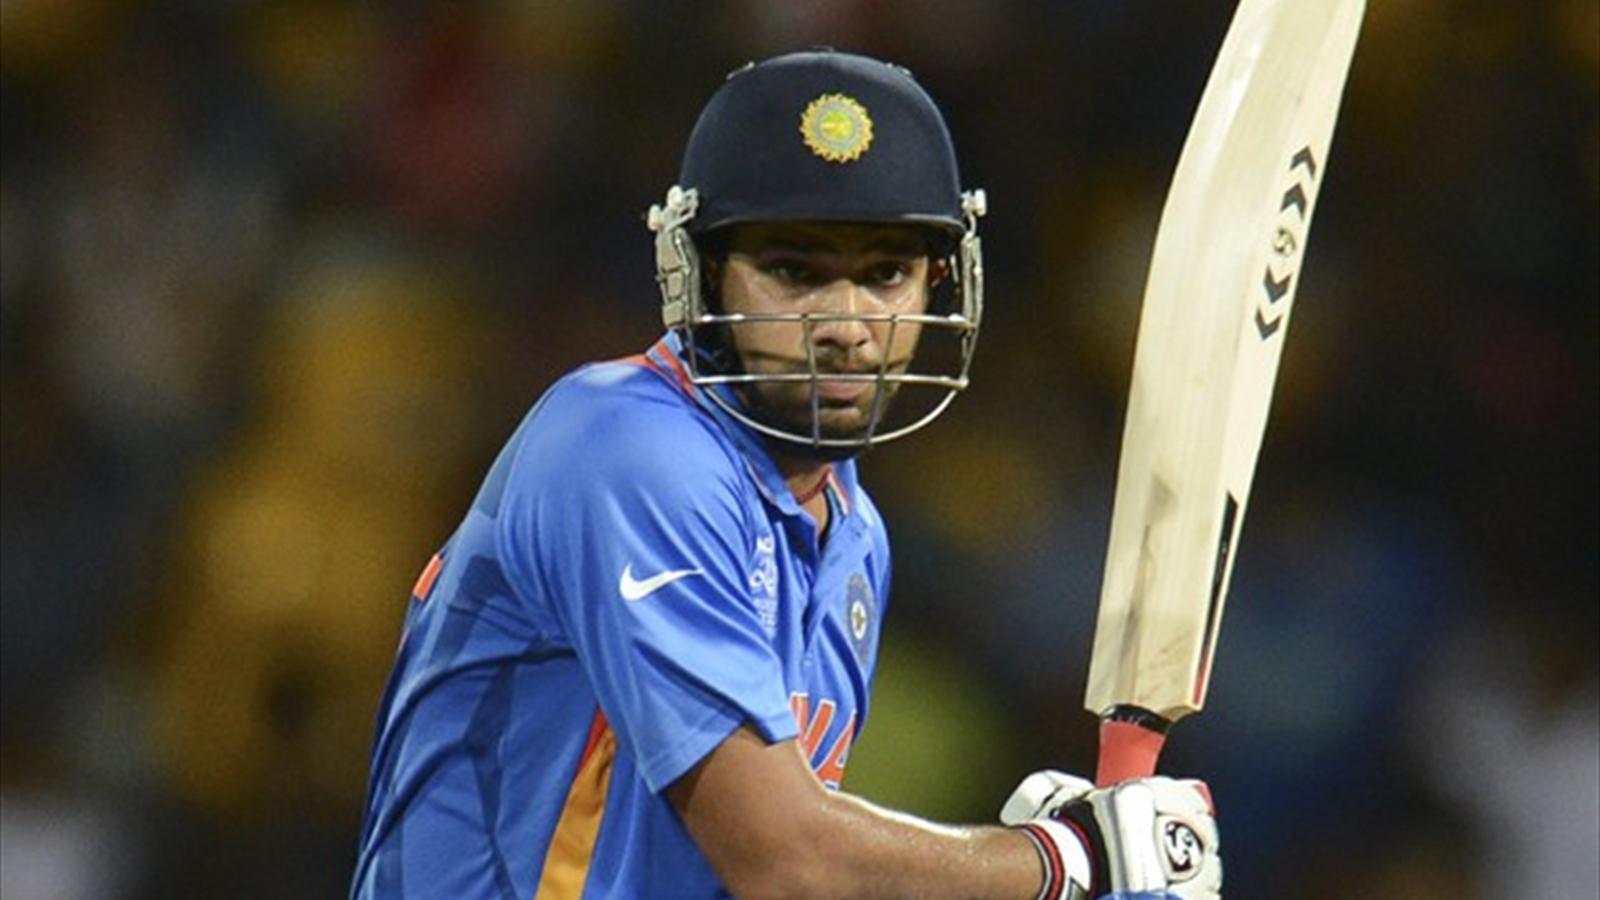 Rohit Sharma breaks one-day world record with 264 innings - Cricket - Eurosport Australia